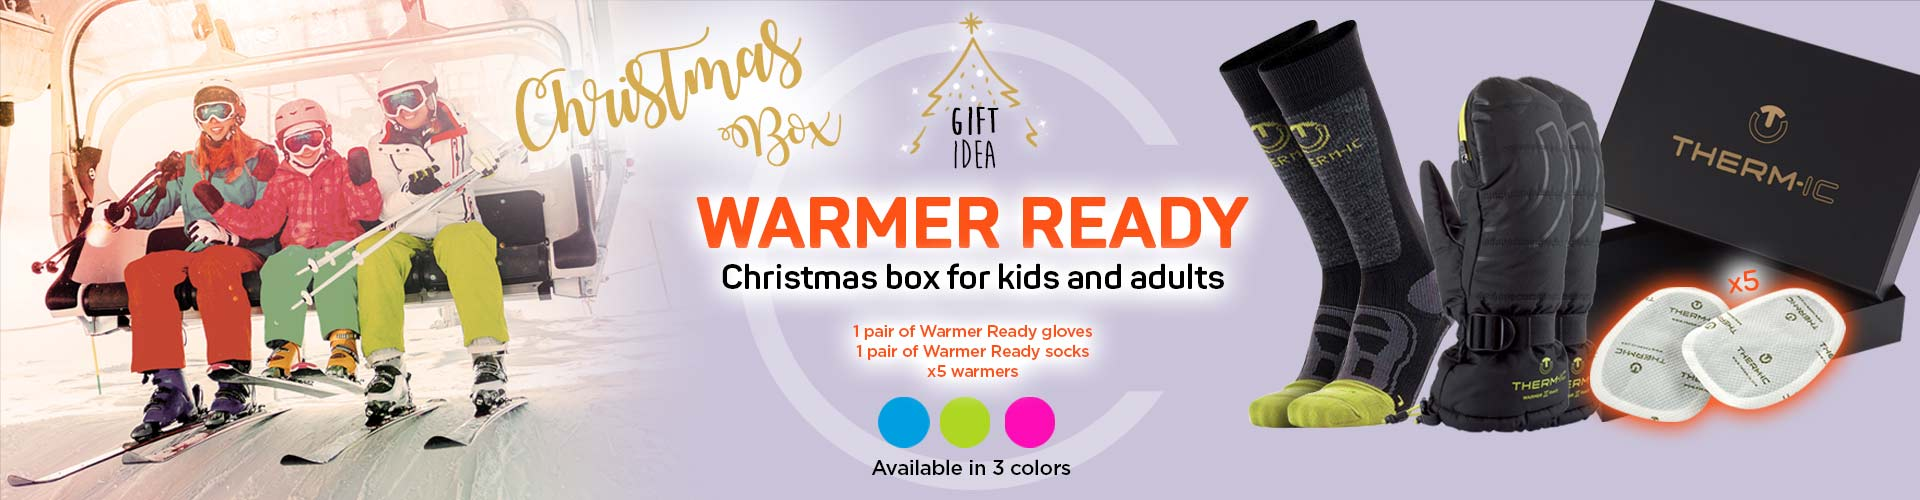 christmas box for adults and kids